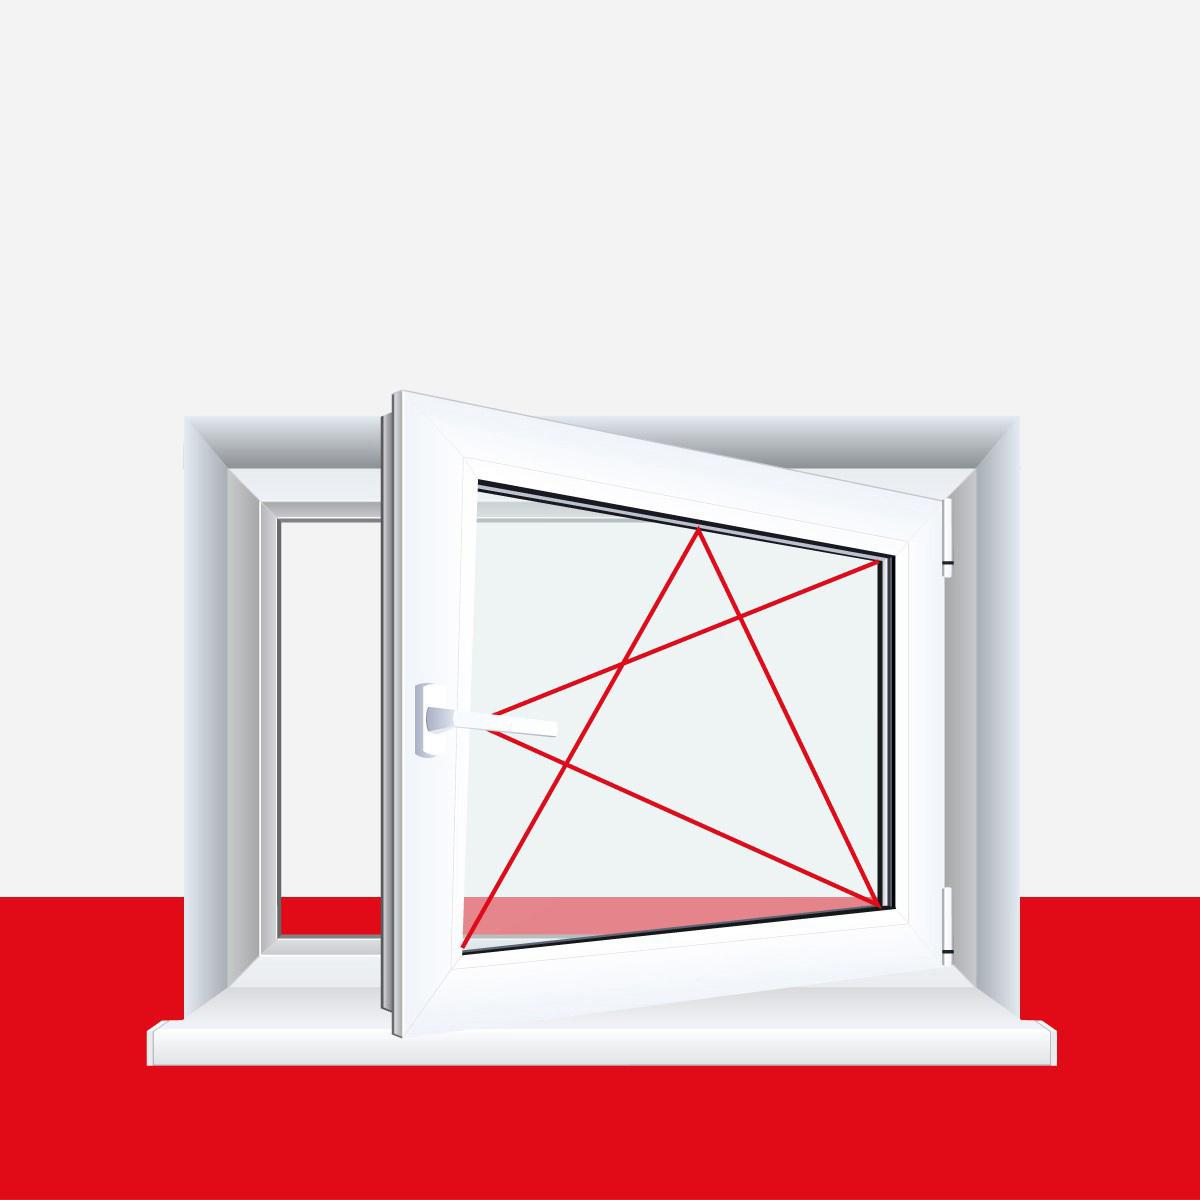 Premium 3 fach Verglasung Dreh-Kipp BxH:60x45 cm DIN Rechts Fenster Kellerfenster Kunststofffenster wei/ß ALLE GR/Ö/ßEN